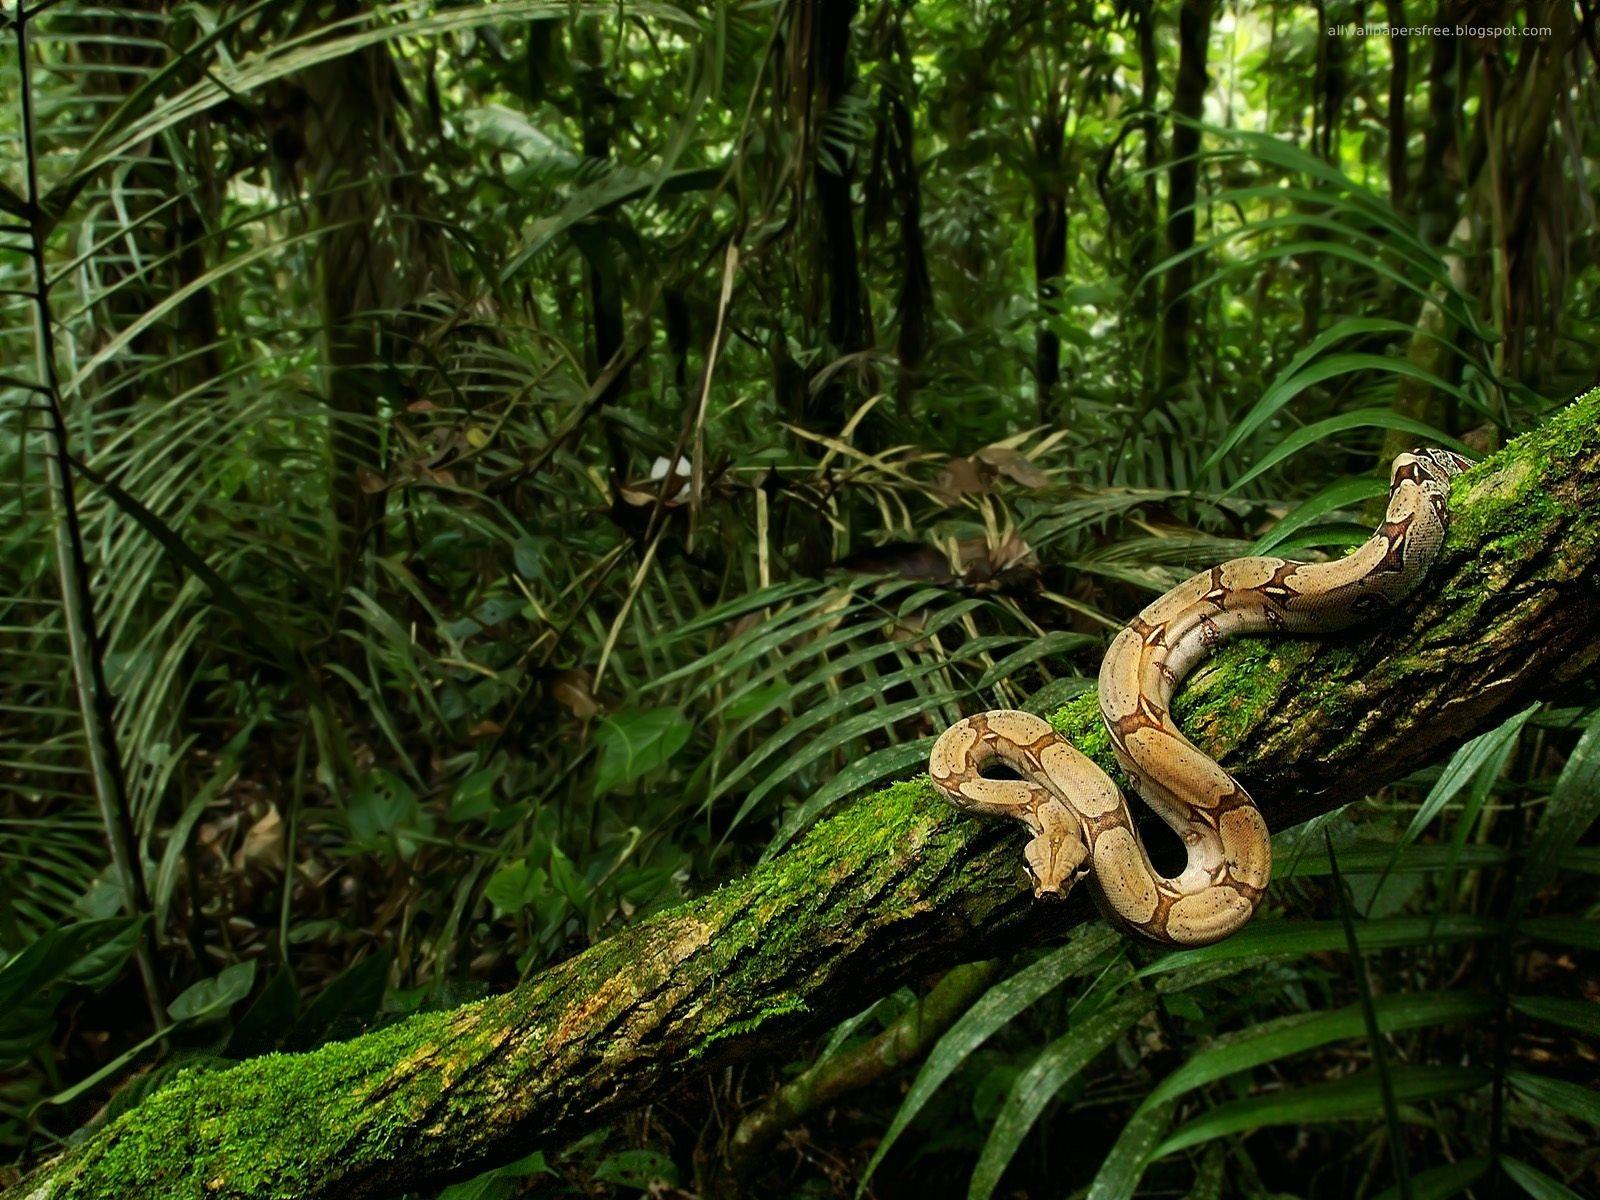 Wildlife Images Wildlife Hd Wallpaper And Background Photos 21003832 Congo Rainforest Rainforest Animals Jungle Forest